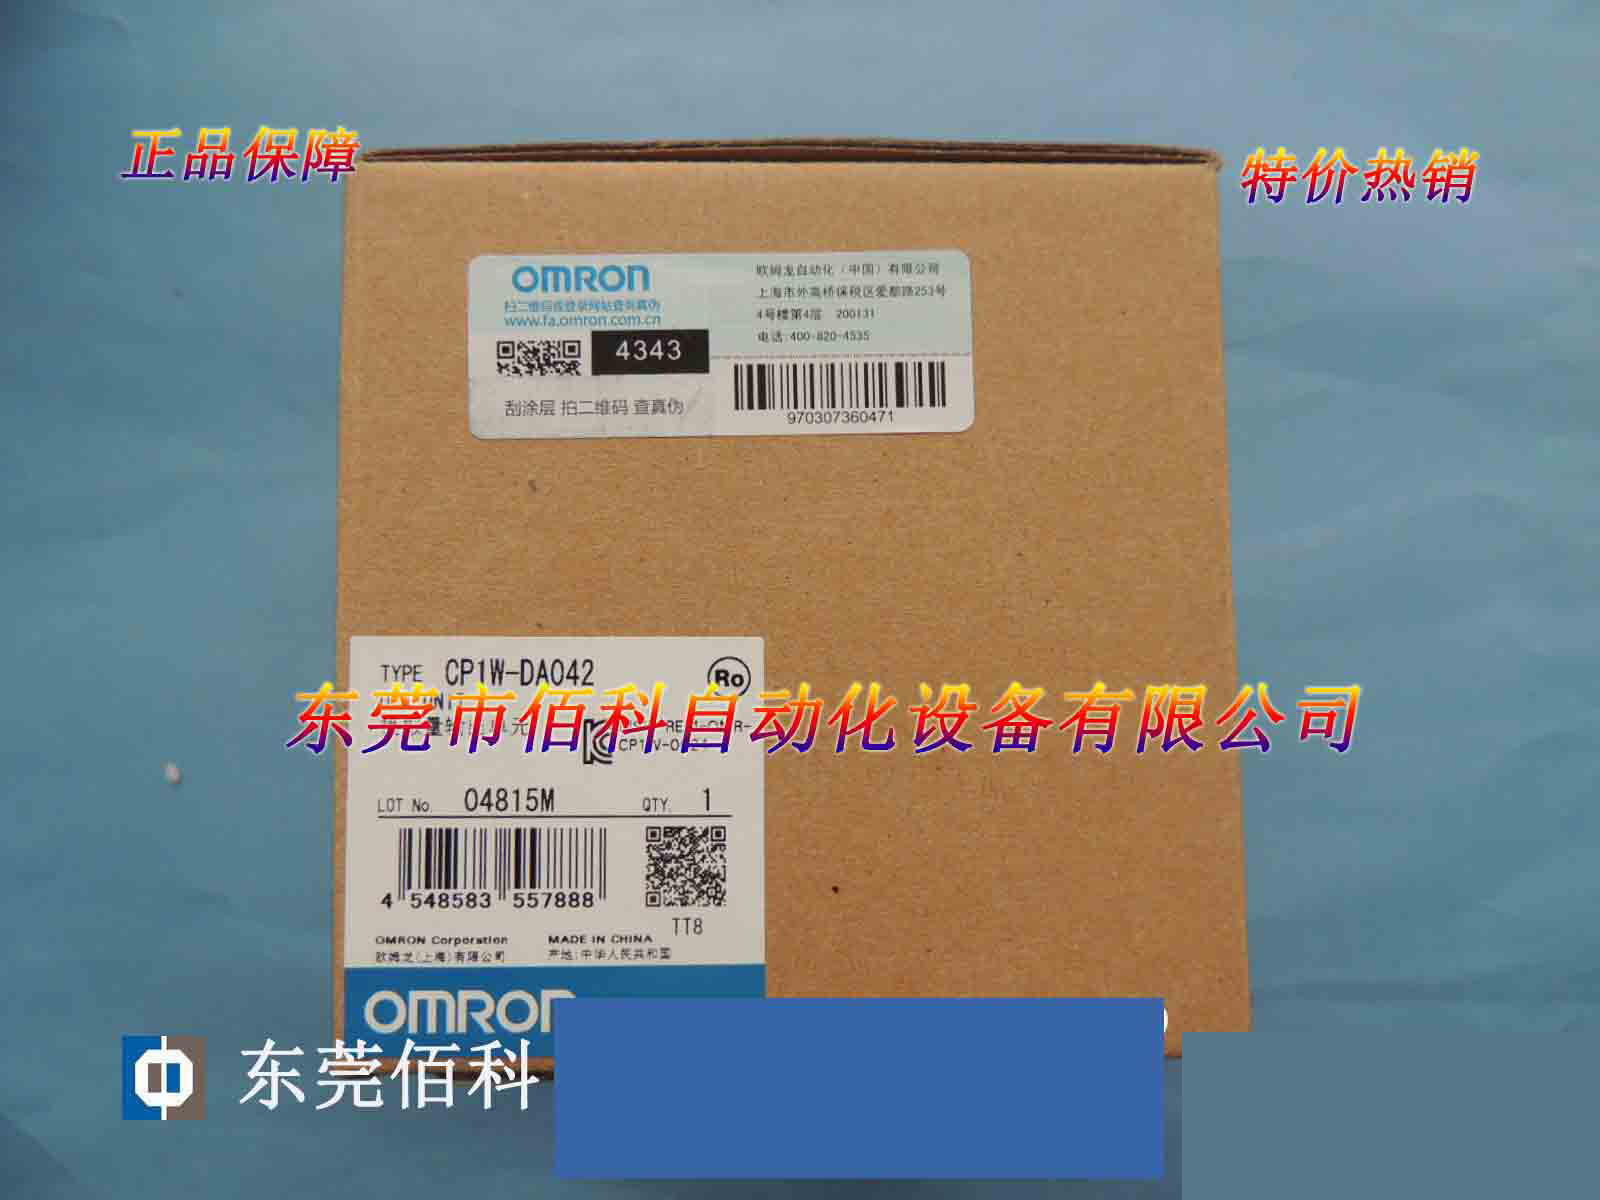 Special offer new original Omron PLC module CP1W-DA042Special offer new original Omron PLC module CP1W-DA042